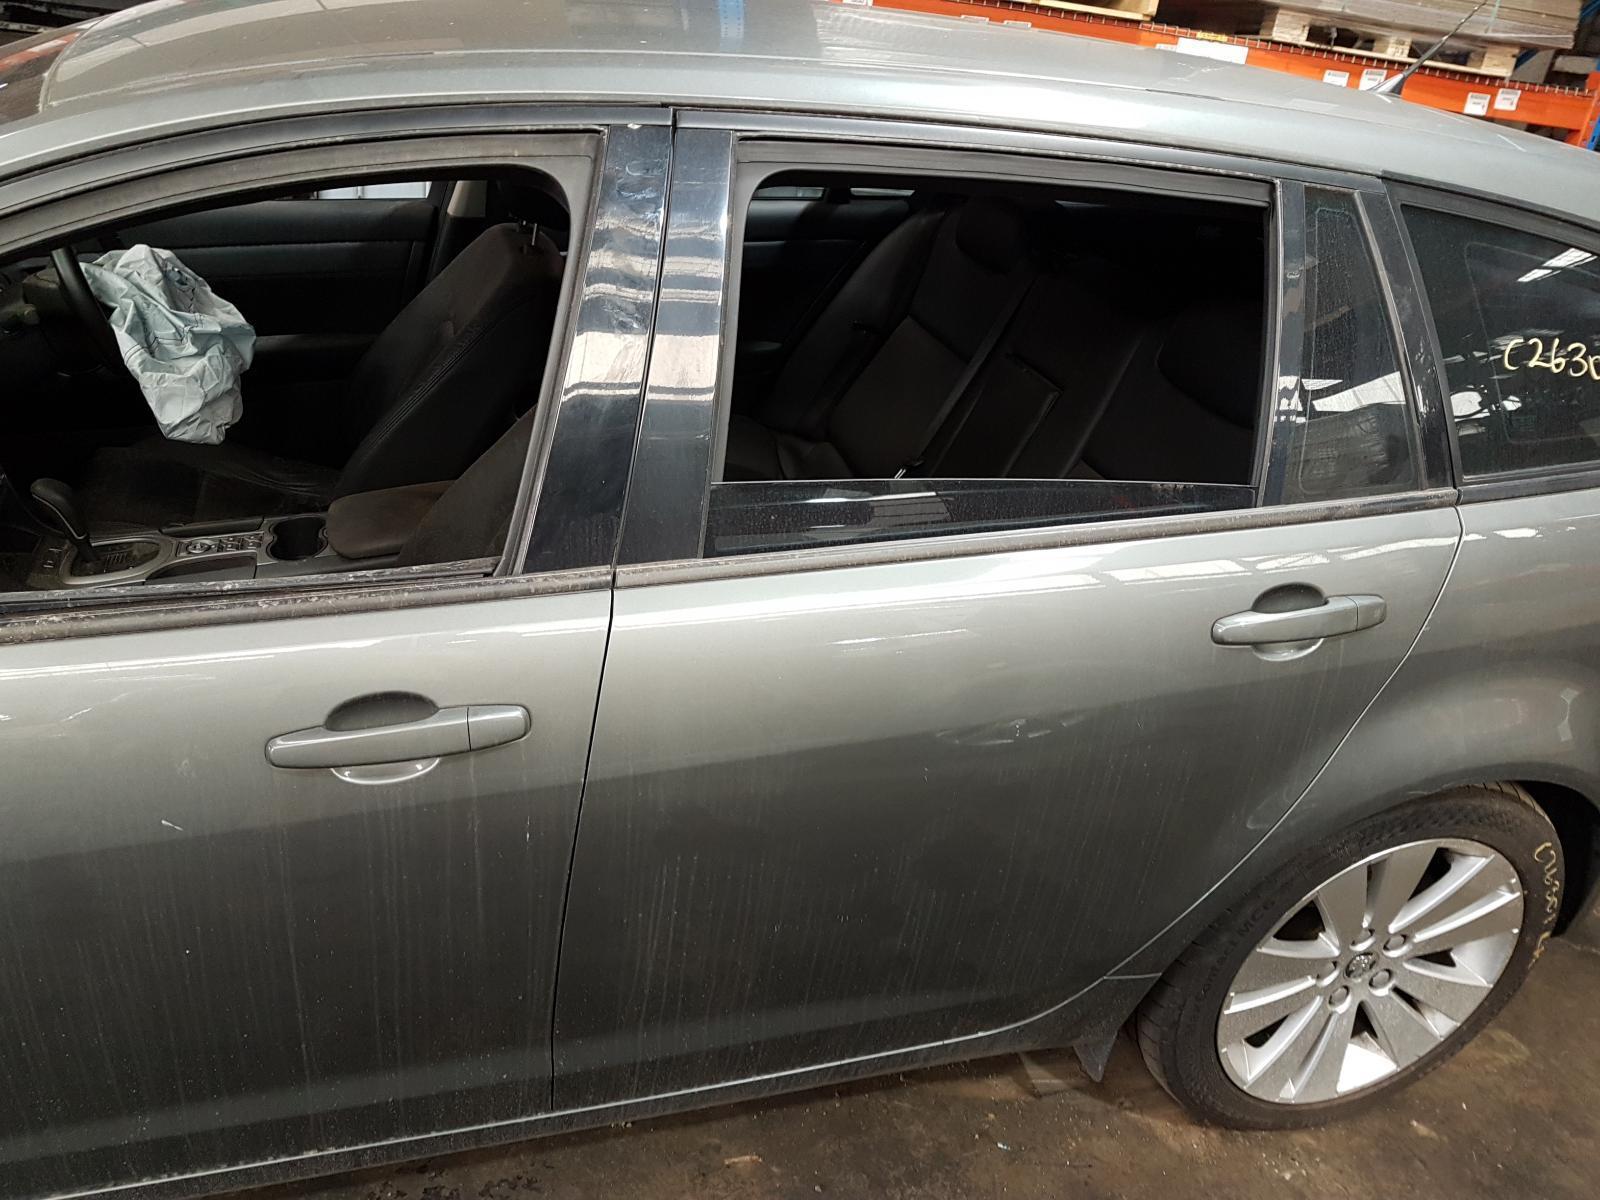 View Auto part Left Rear Door/Sliding Holden Commodore 2012